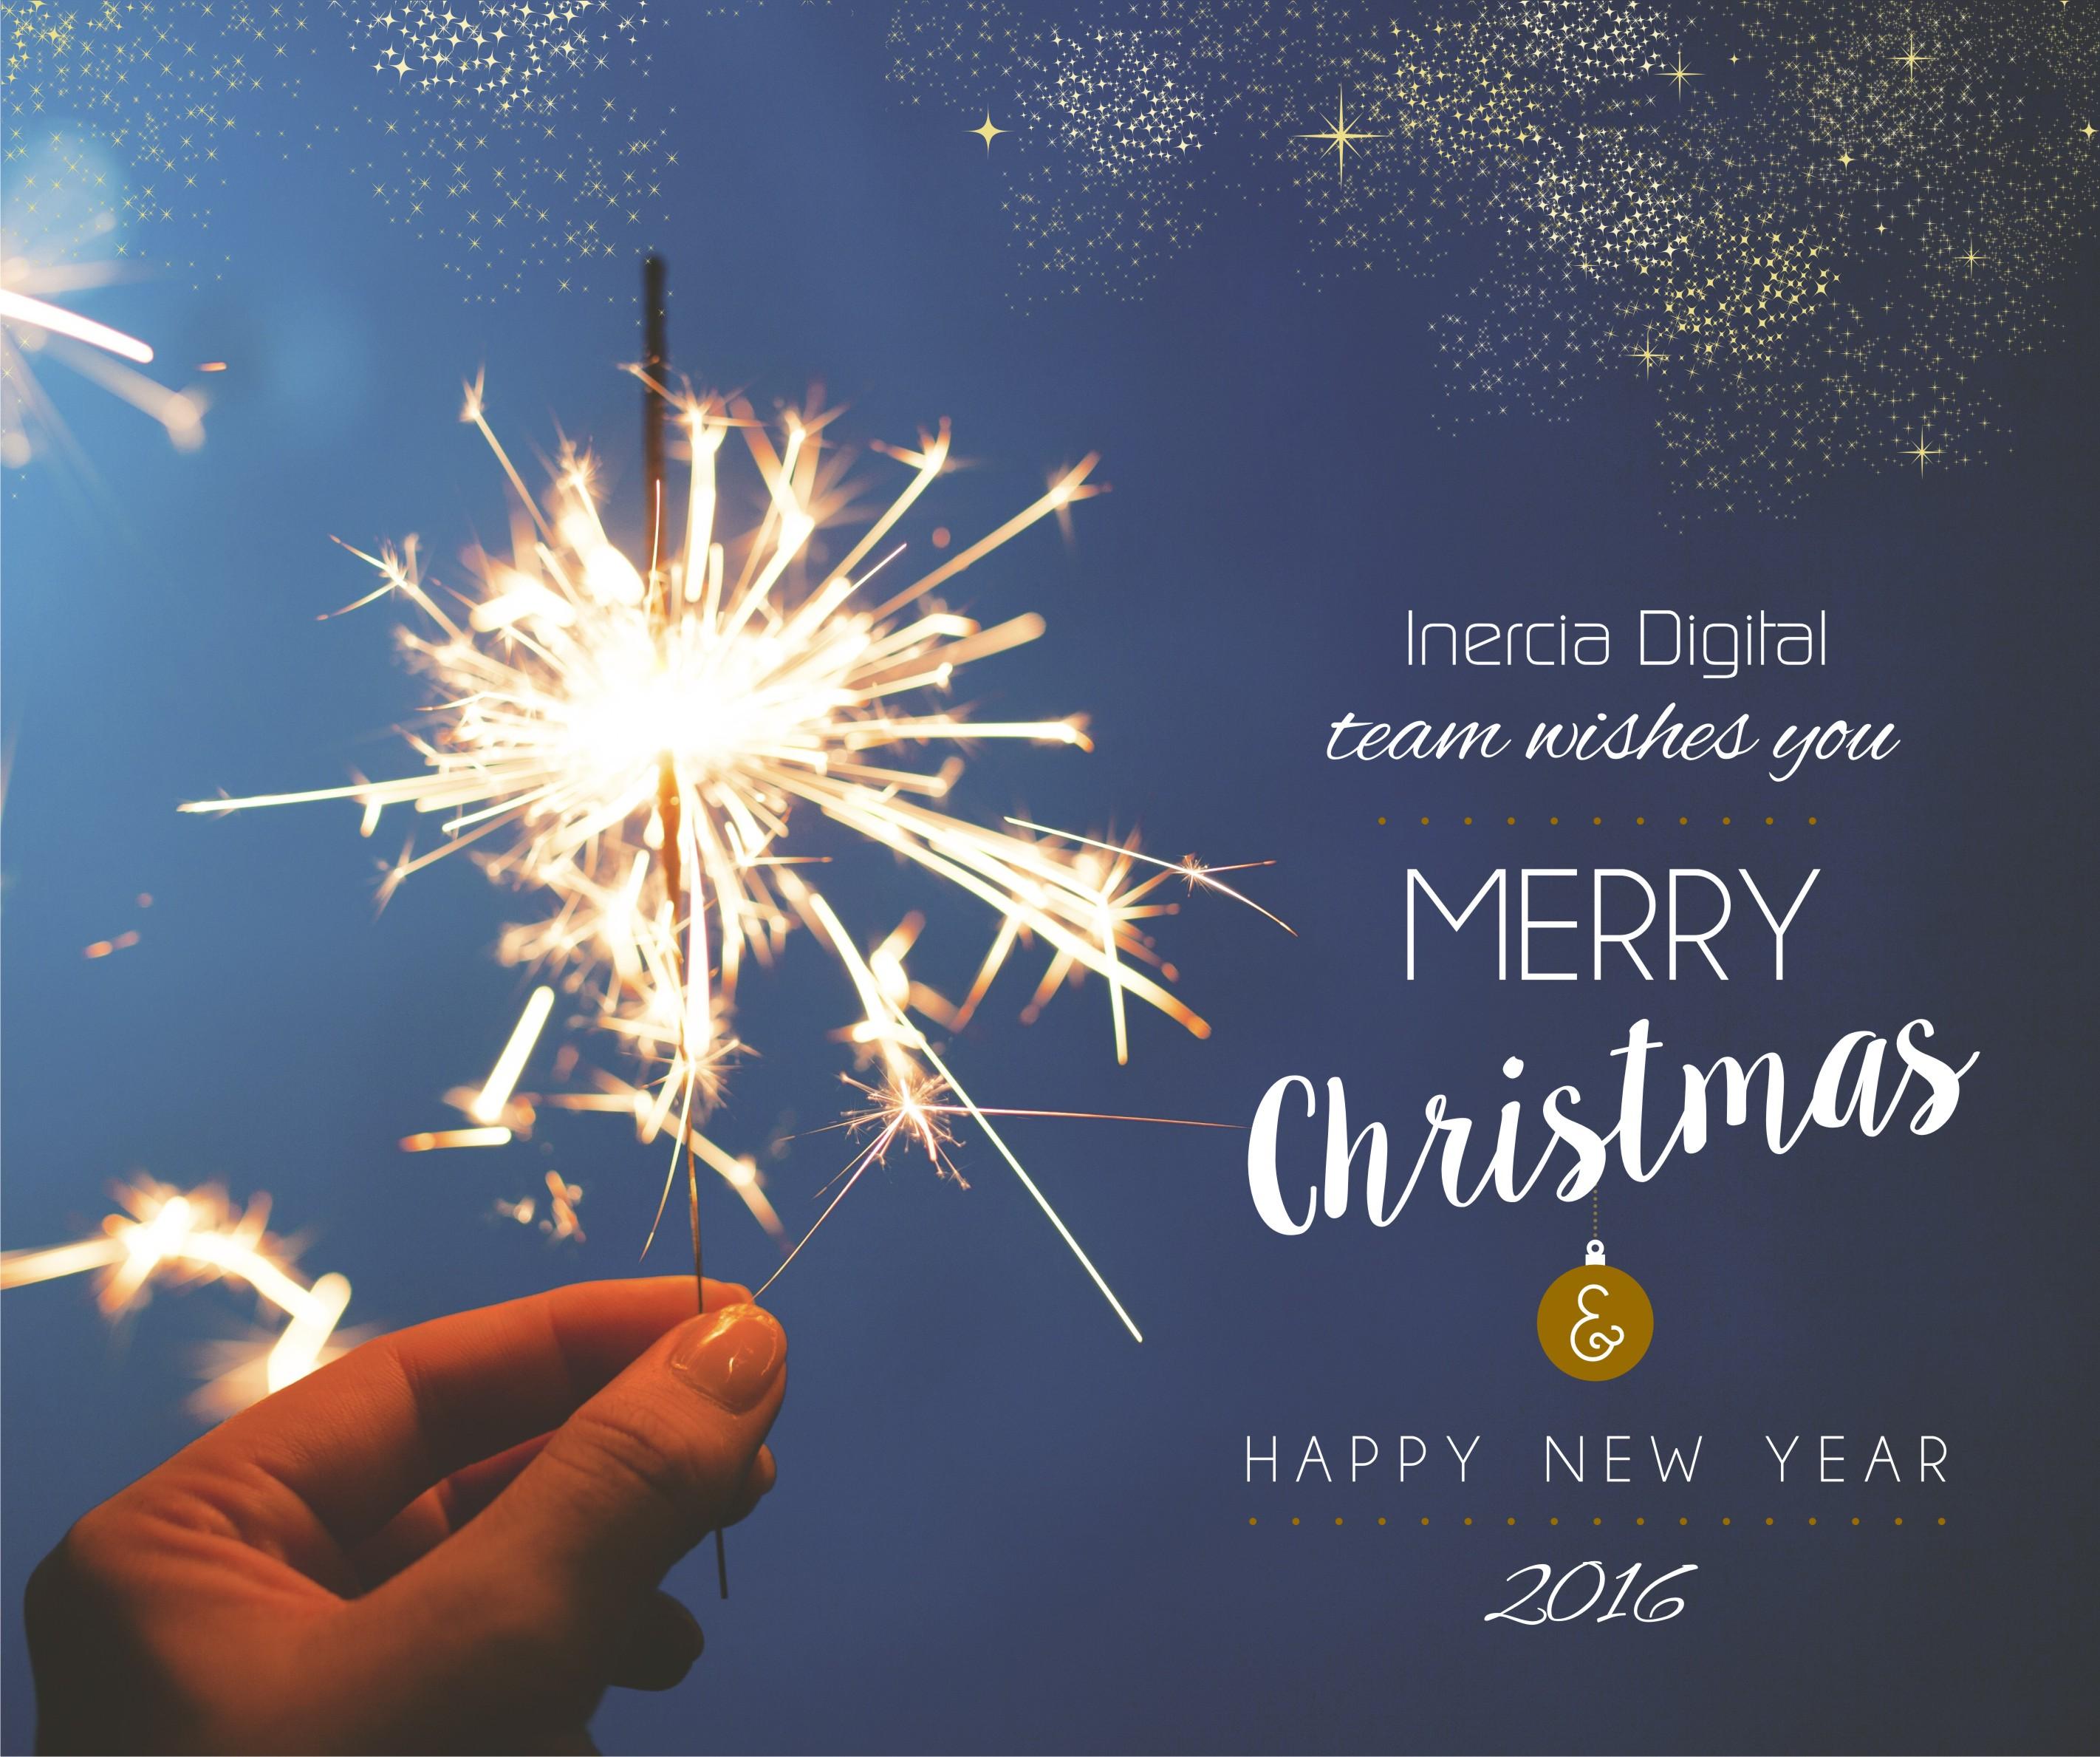 Inercia Digital feliz navidad 2016